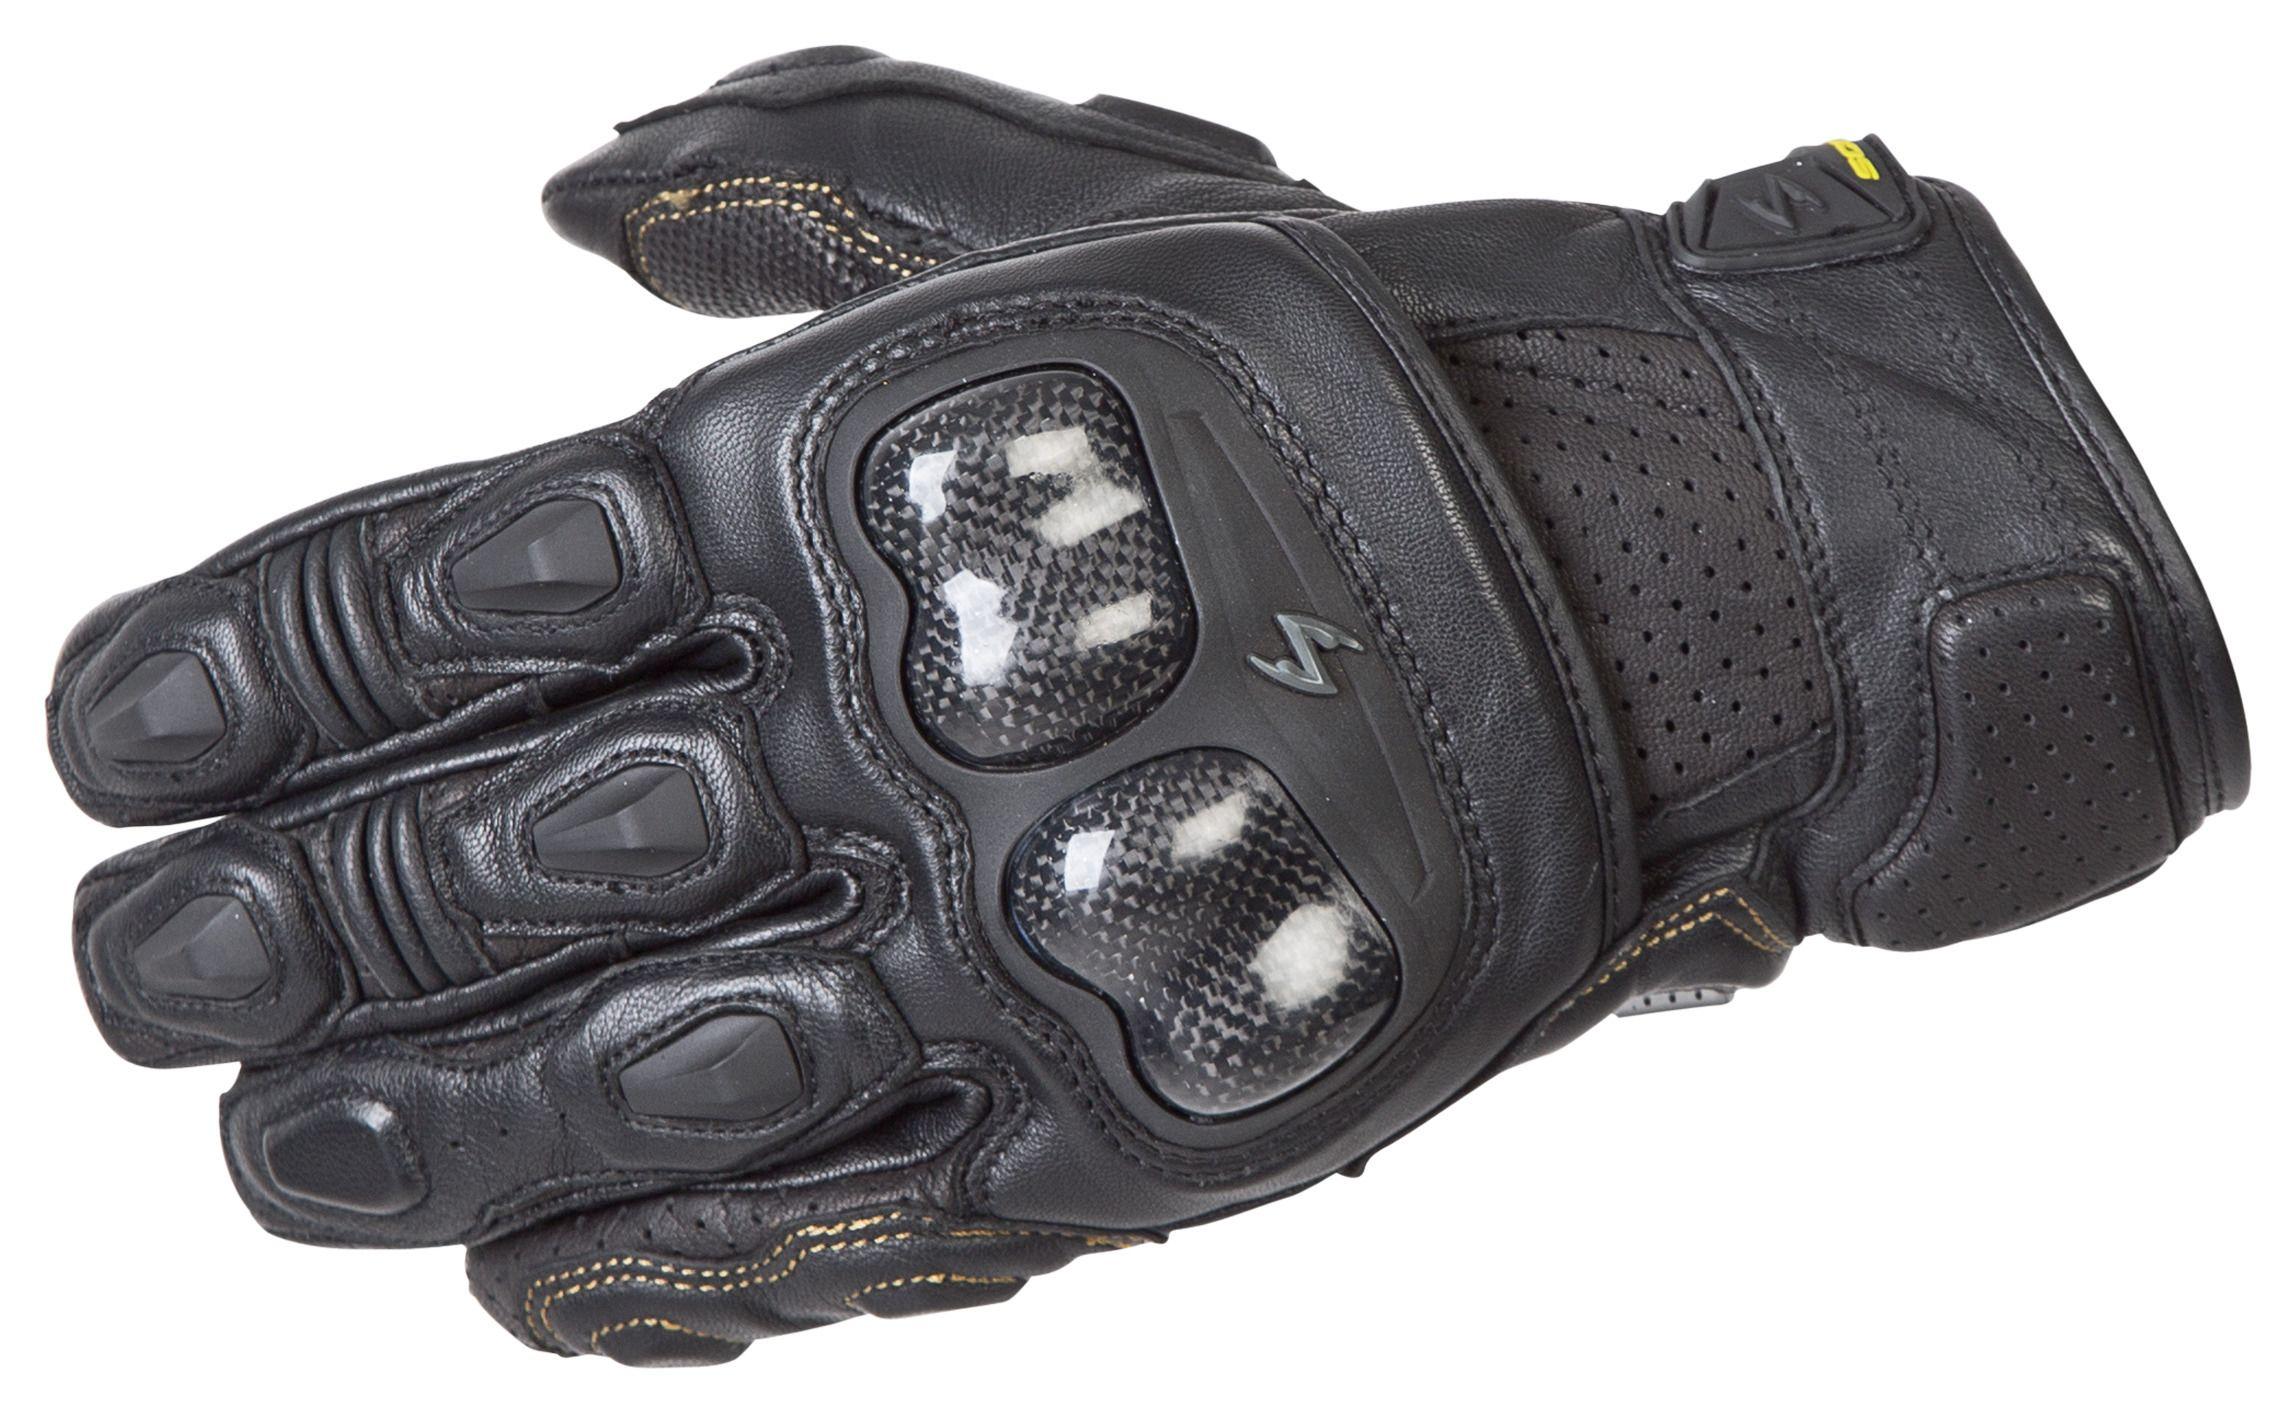 Motorcycle gloves large - Motorcycle Gloves Large